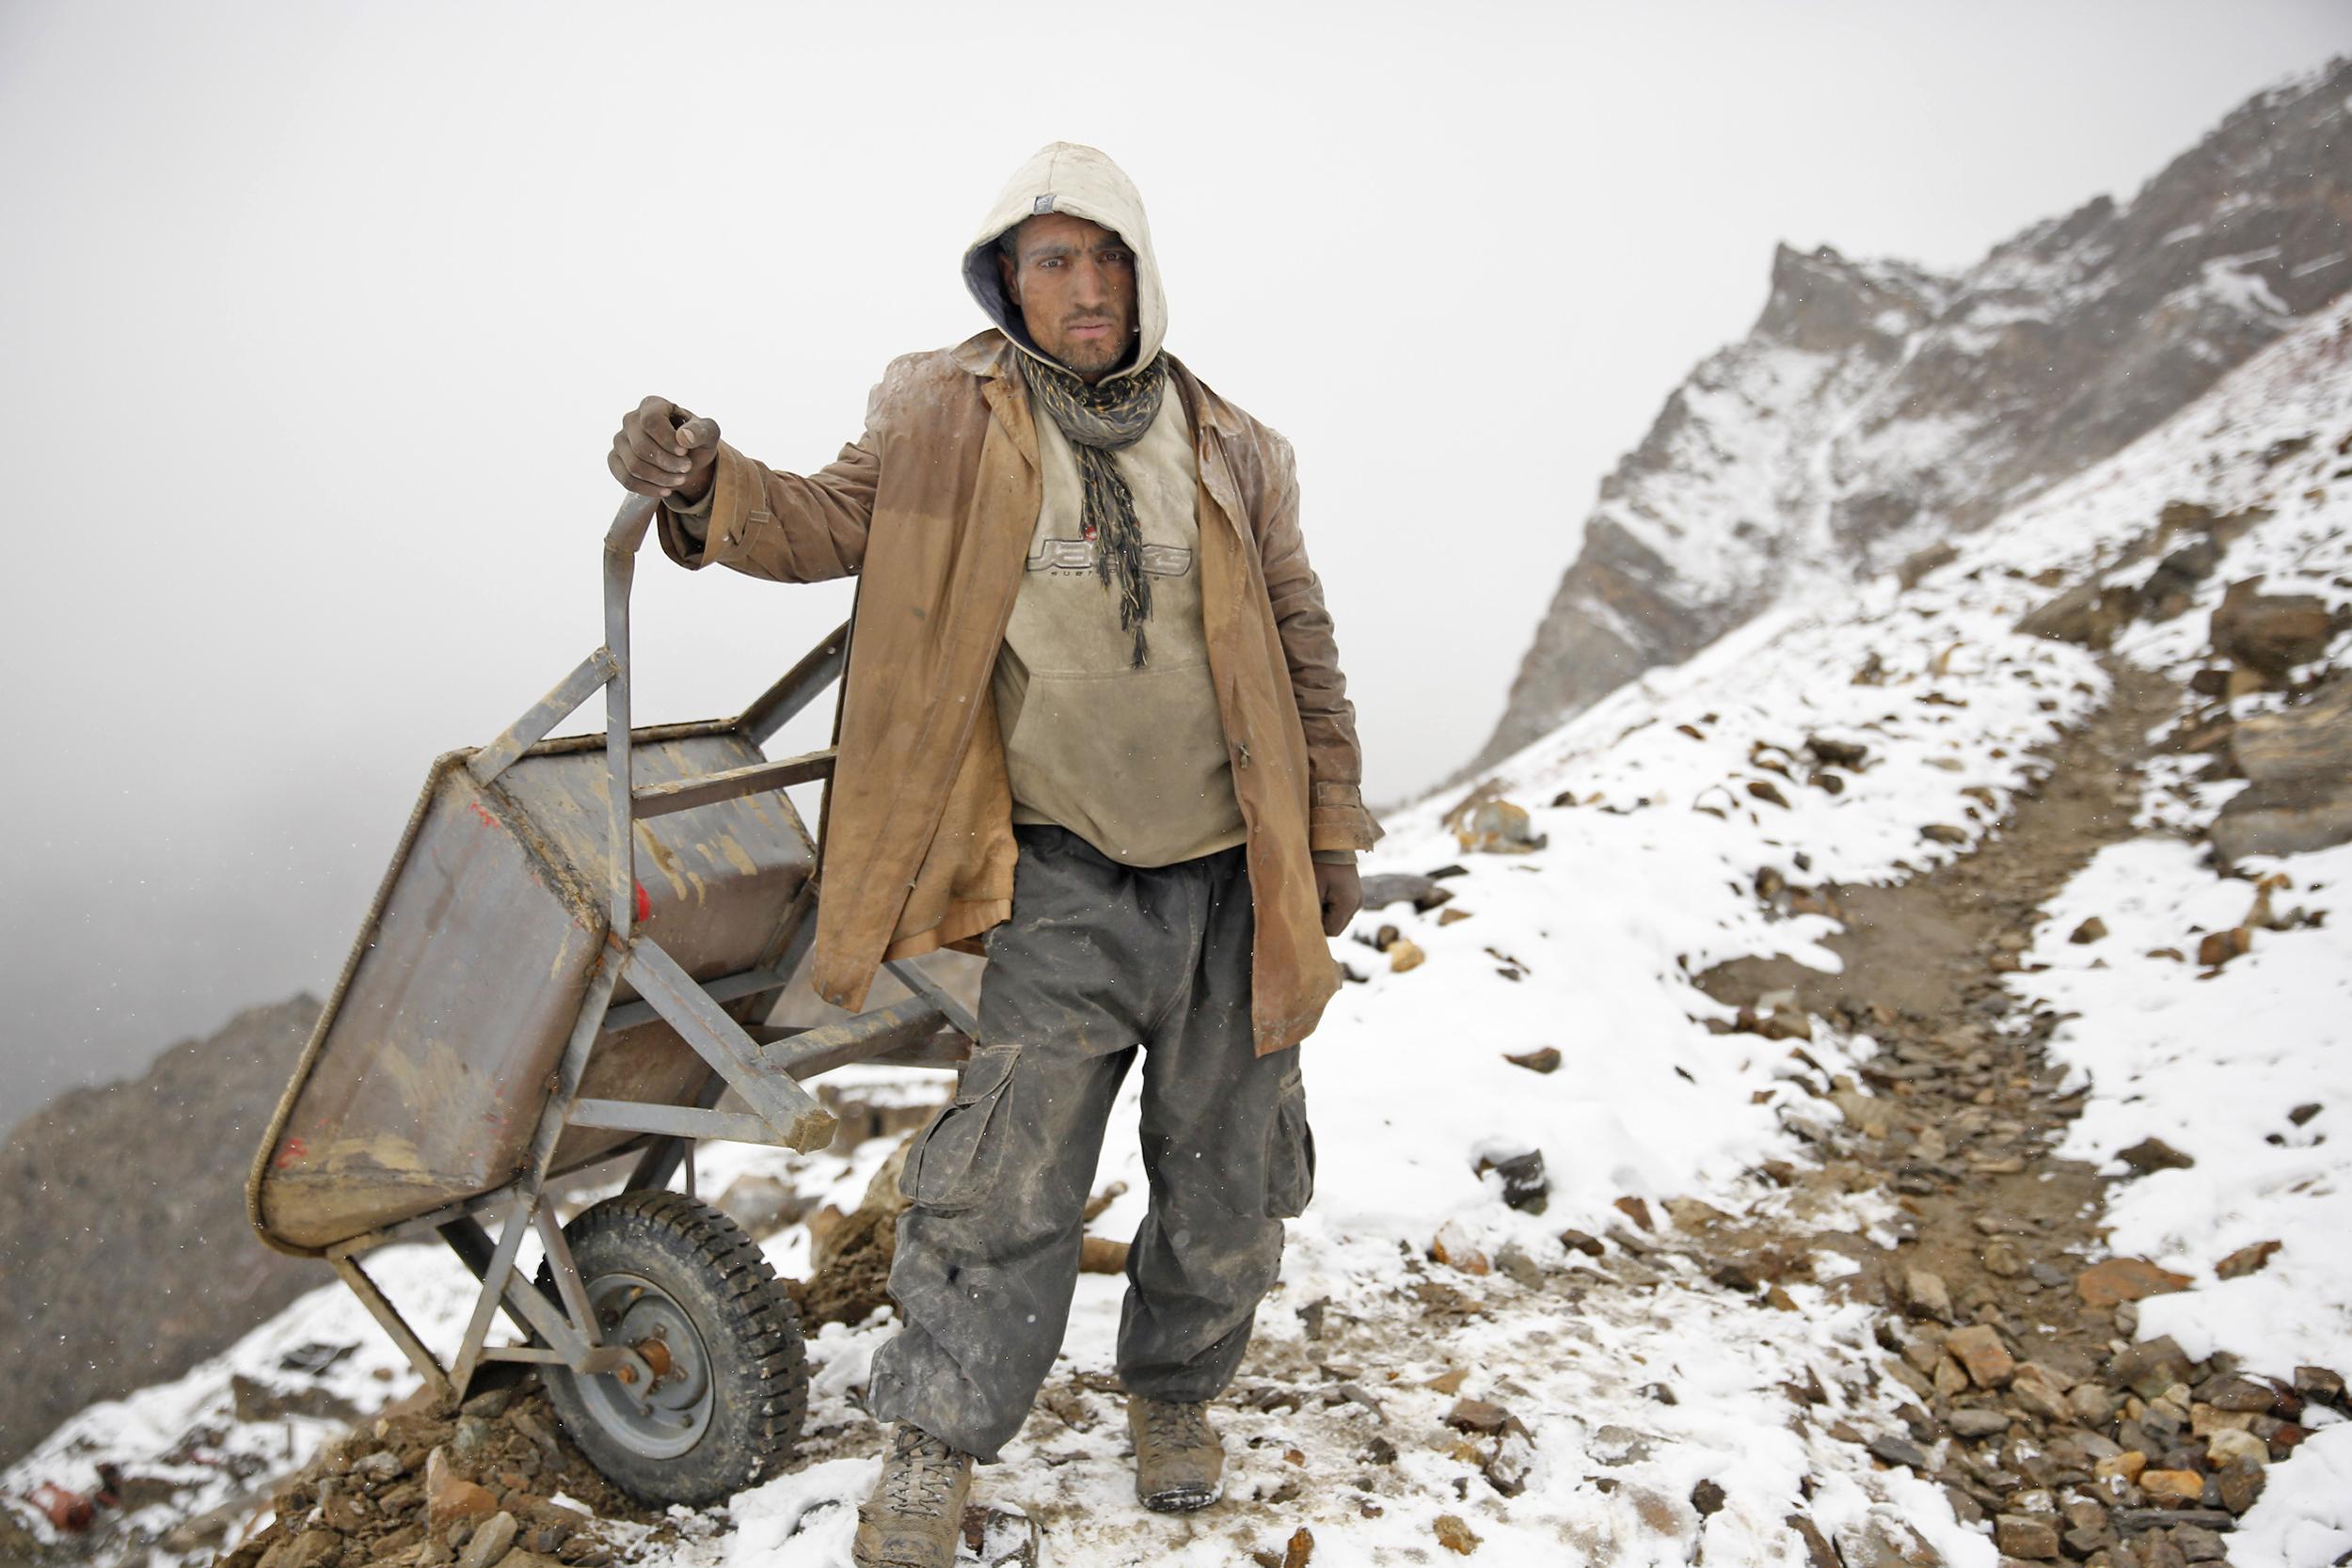 Miners' Camp, Northern Pakistan, 2015